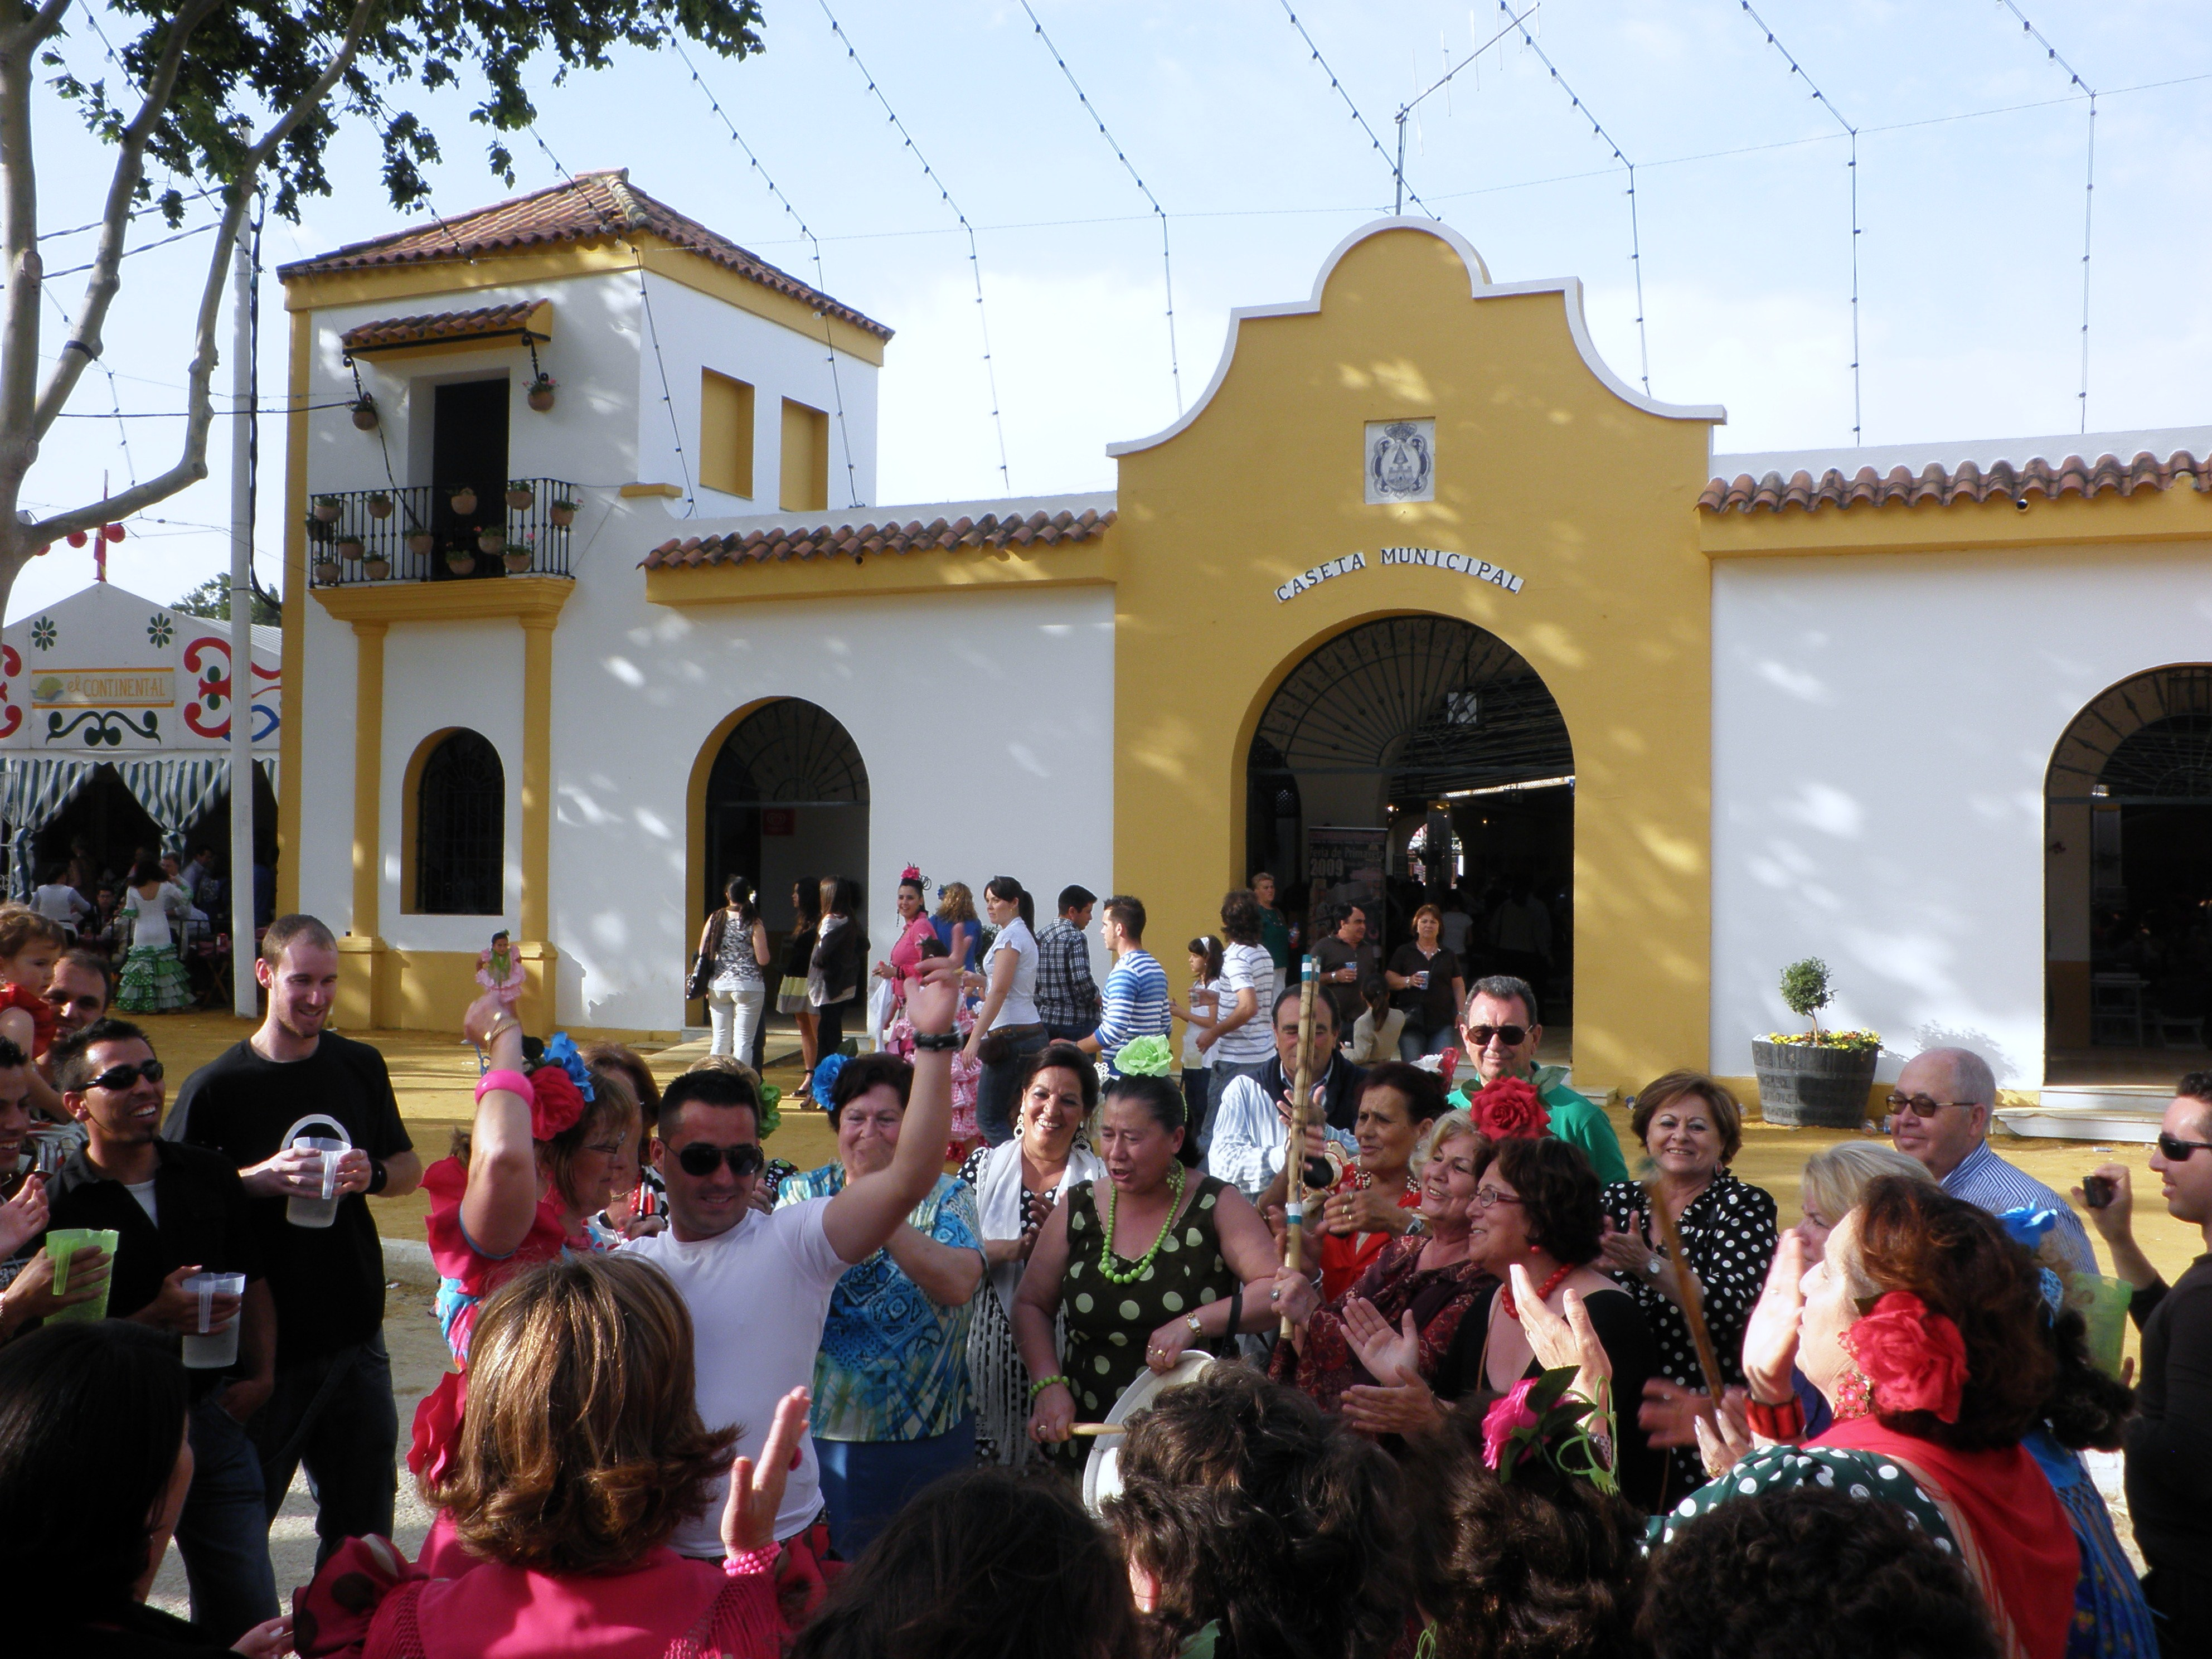 filecaseta municipal feria de primavera y fiesta del vino finojpg